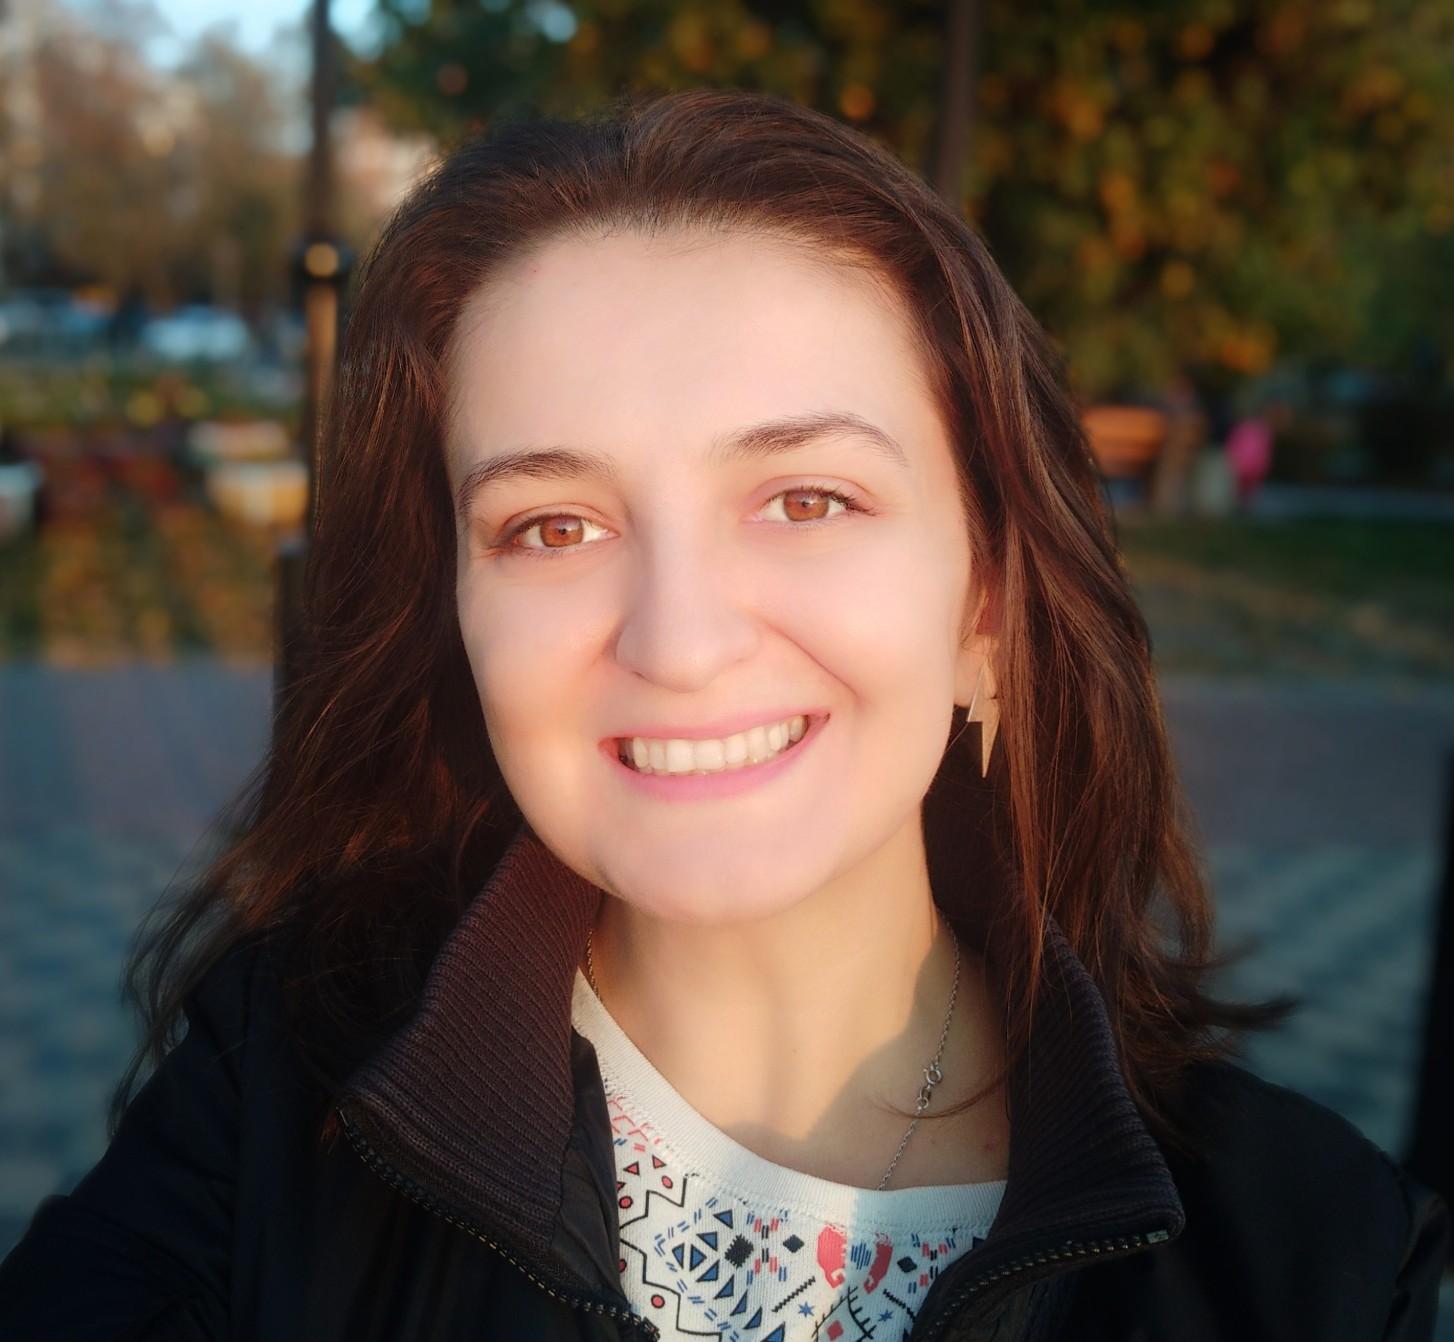 Tetyana Dubynka